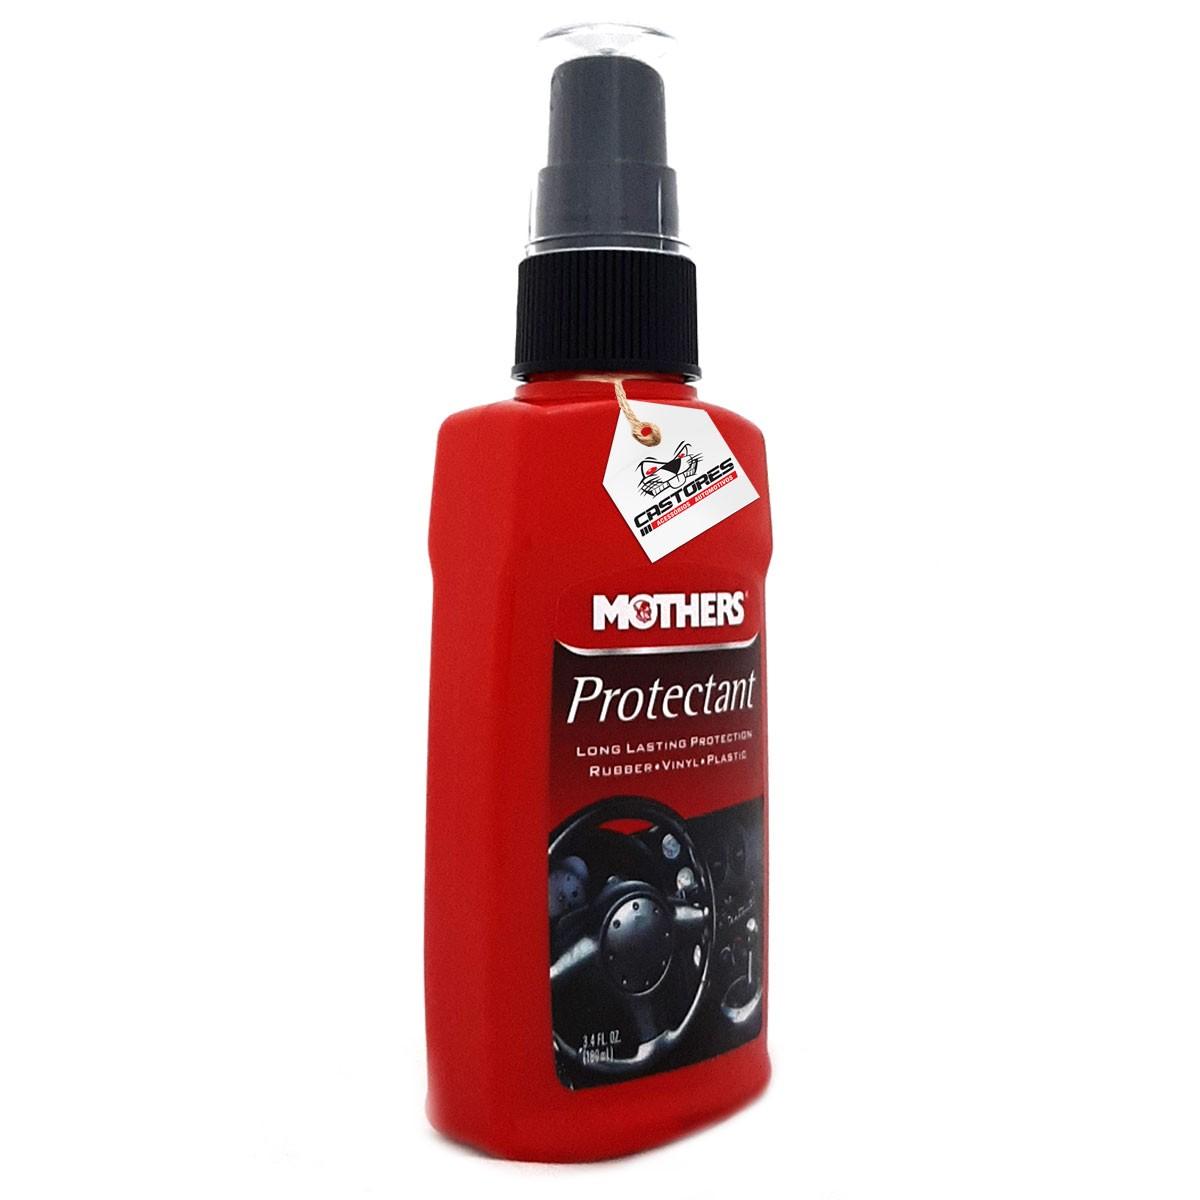 PROTECTANT  - RUBBER VINYL PLASTIC CARE 118 ML